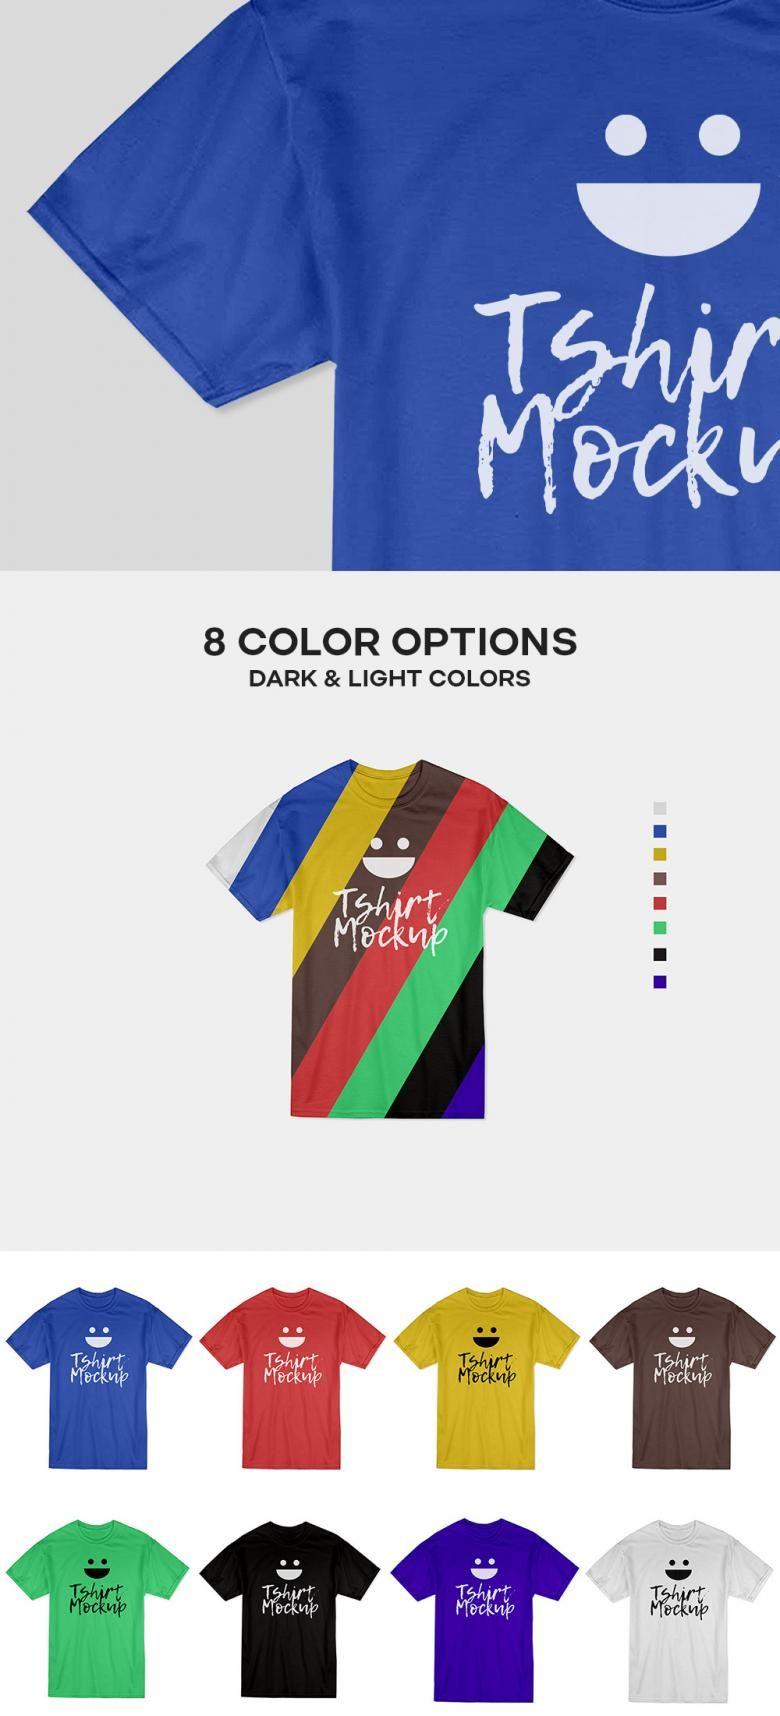 Download Free Cotton T Shirt Mockup Psd Shirt Mockup Tshirt Mockup Design Mockup Free